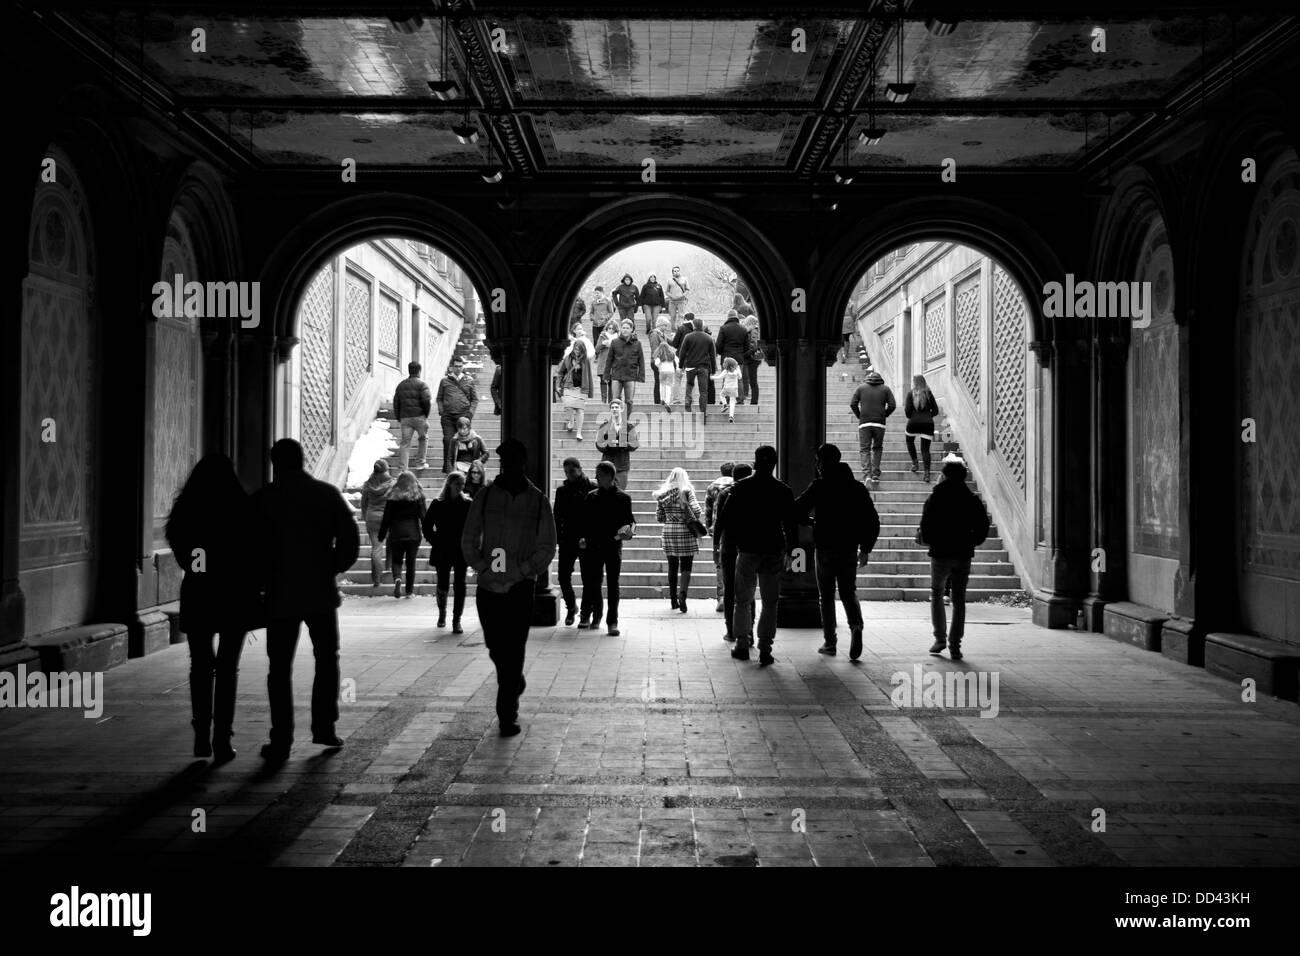 Bethesda Terrace Arcade, New York, Central Park - Stock Image